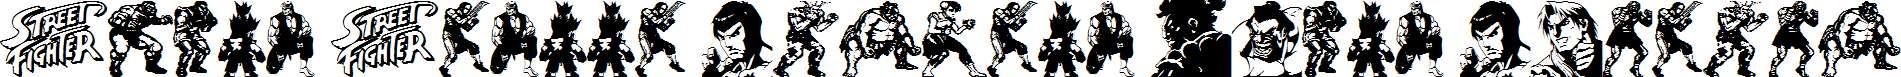 Super-Street-Fighter-Hyper-Fonting